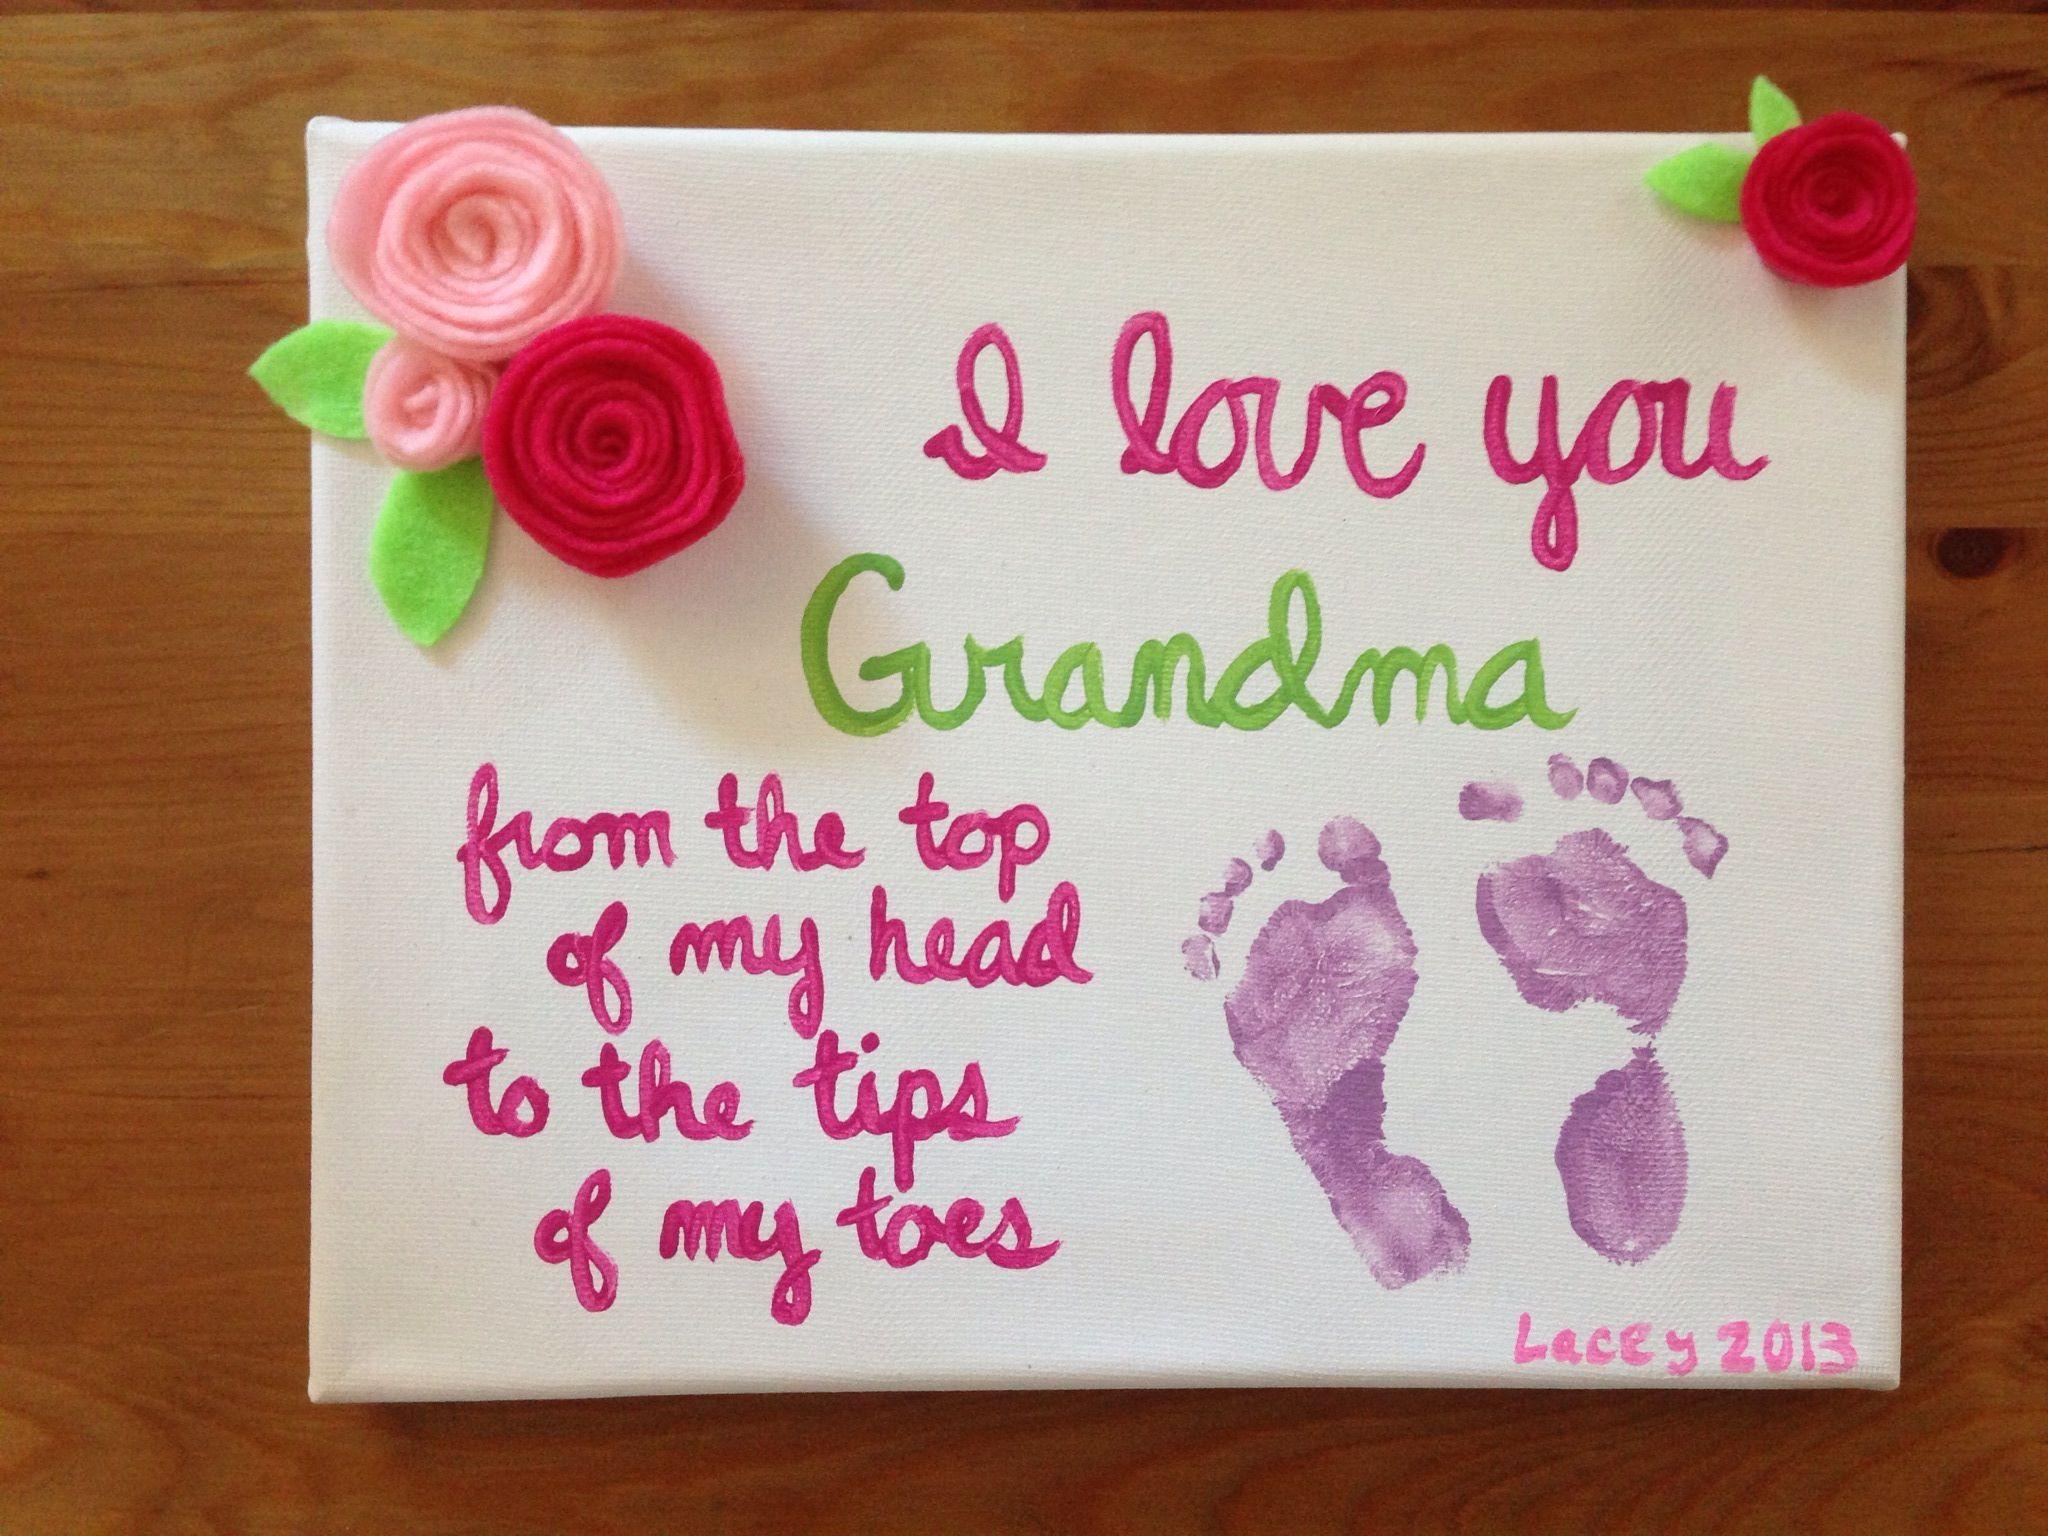 Baby Footprint Gift For Grandma Hand Made Felt Flowers And Acrylic Paint On A Canvas